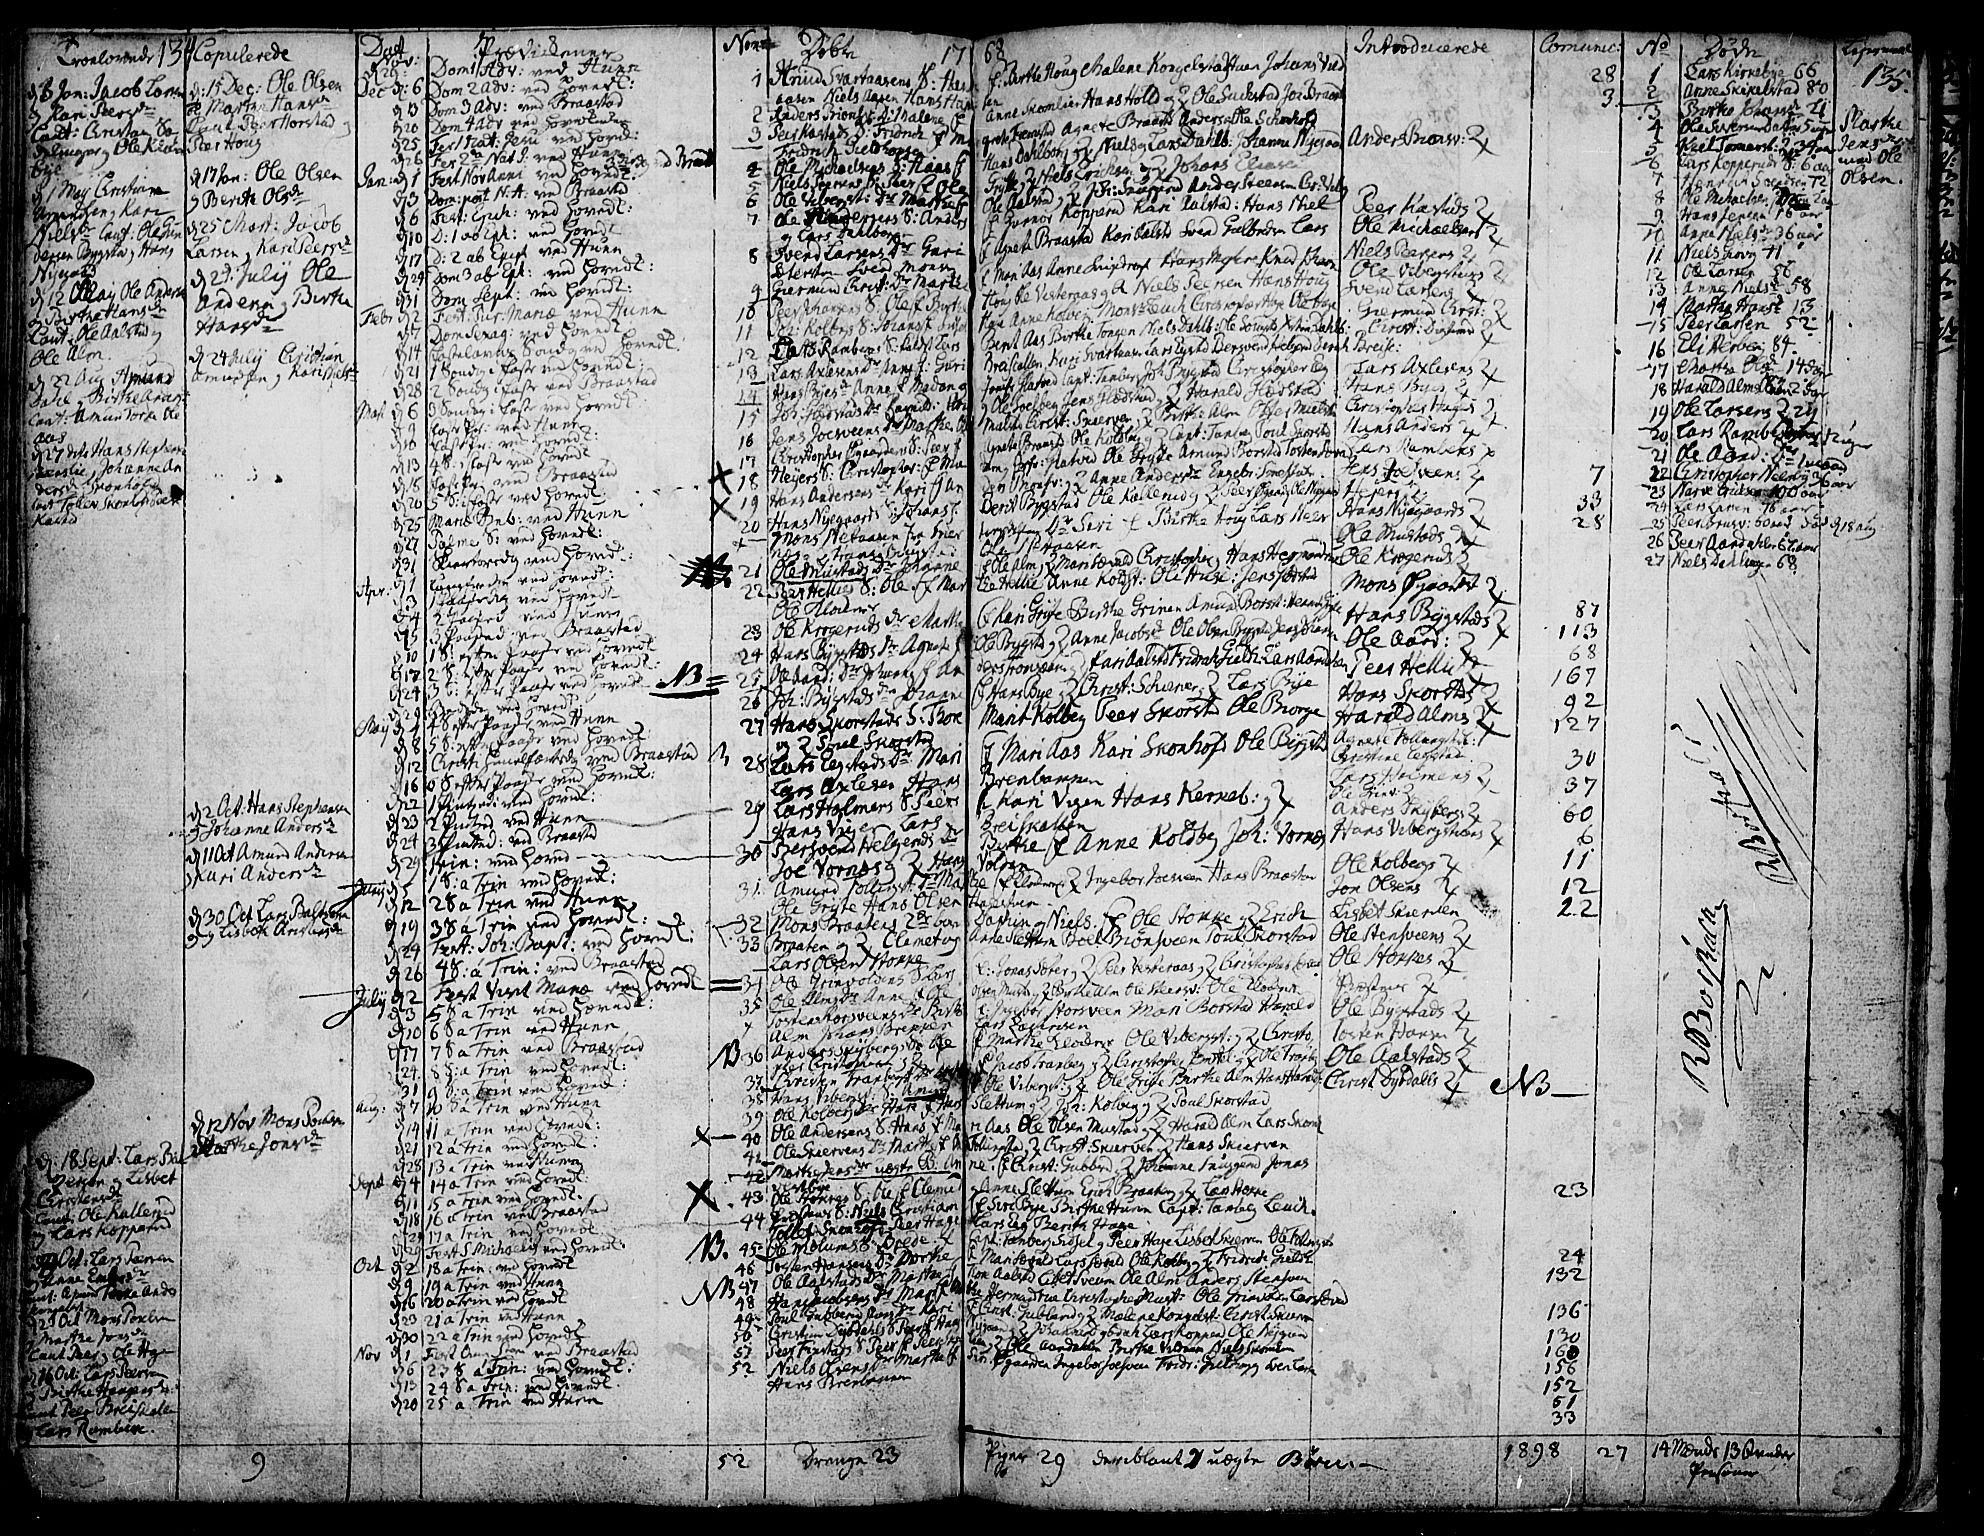 SAH, Vardal prestekontor, H/Ha/Haa/L0002: Ministerialbok nr. 2, 1748-1776, s. 134-135